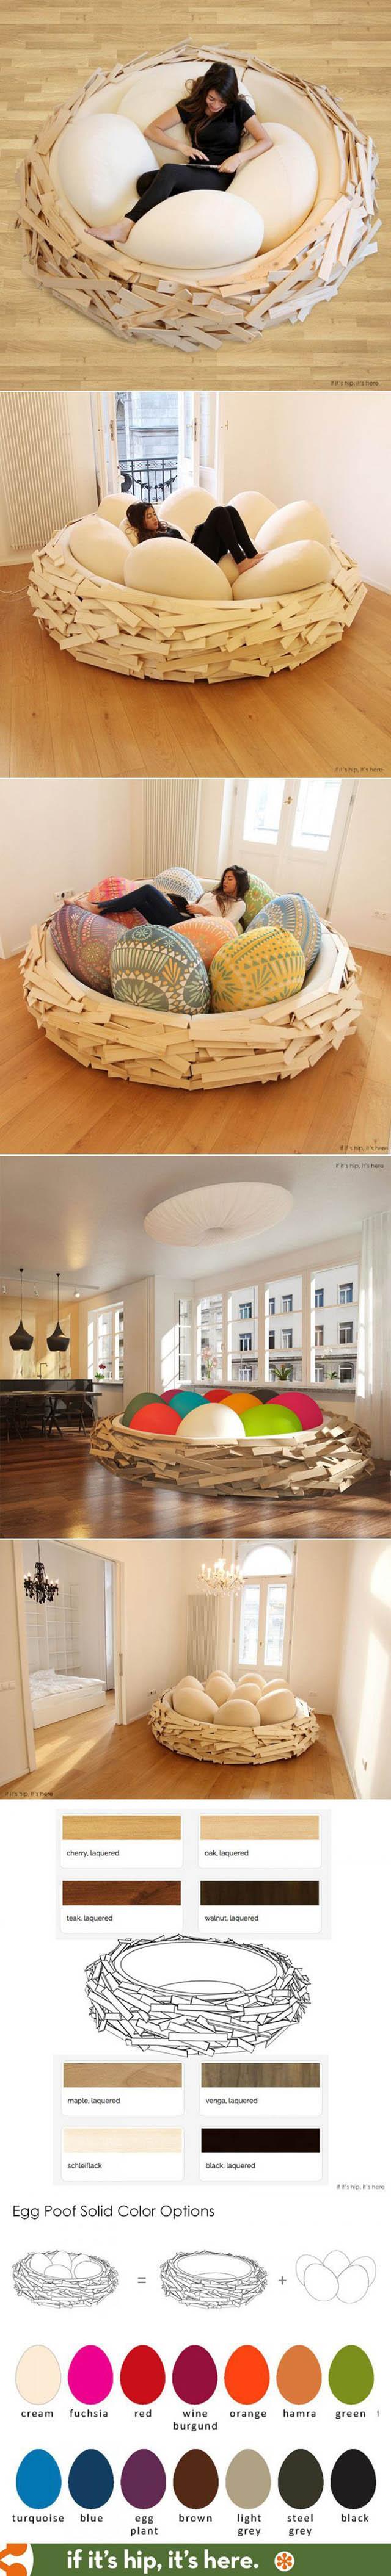 Yumusacik Puf Koltuk Modelleri Home Home Decor Room